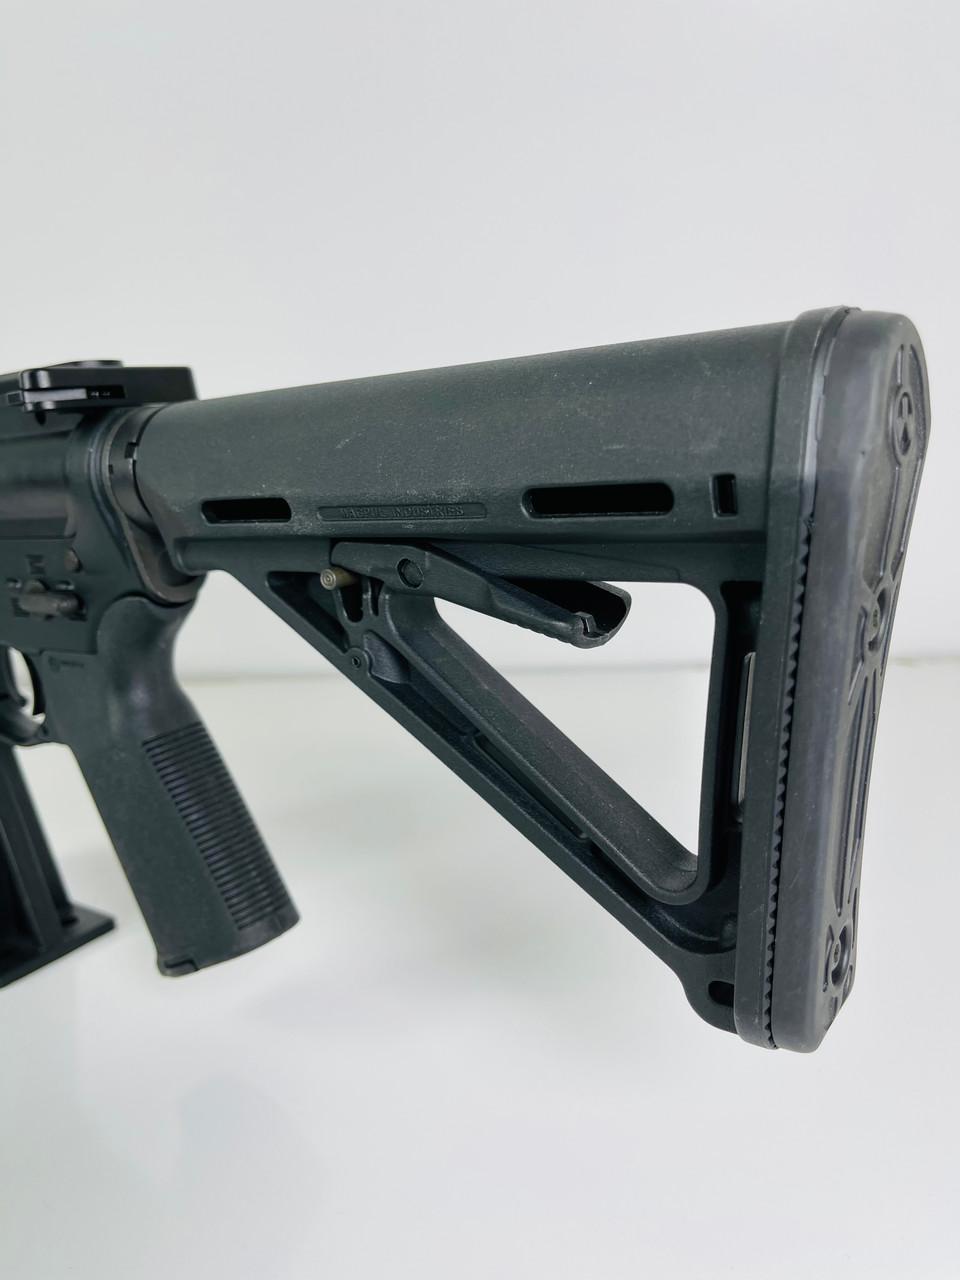 Advanced Armament Corp MPW 300BLK Rifle Gen1